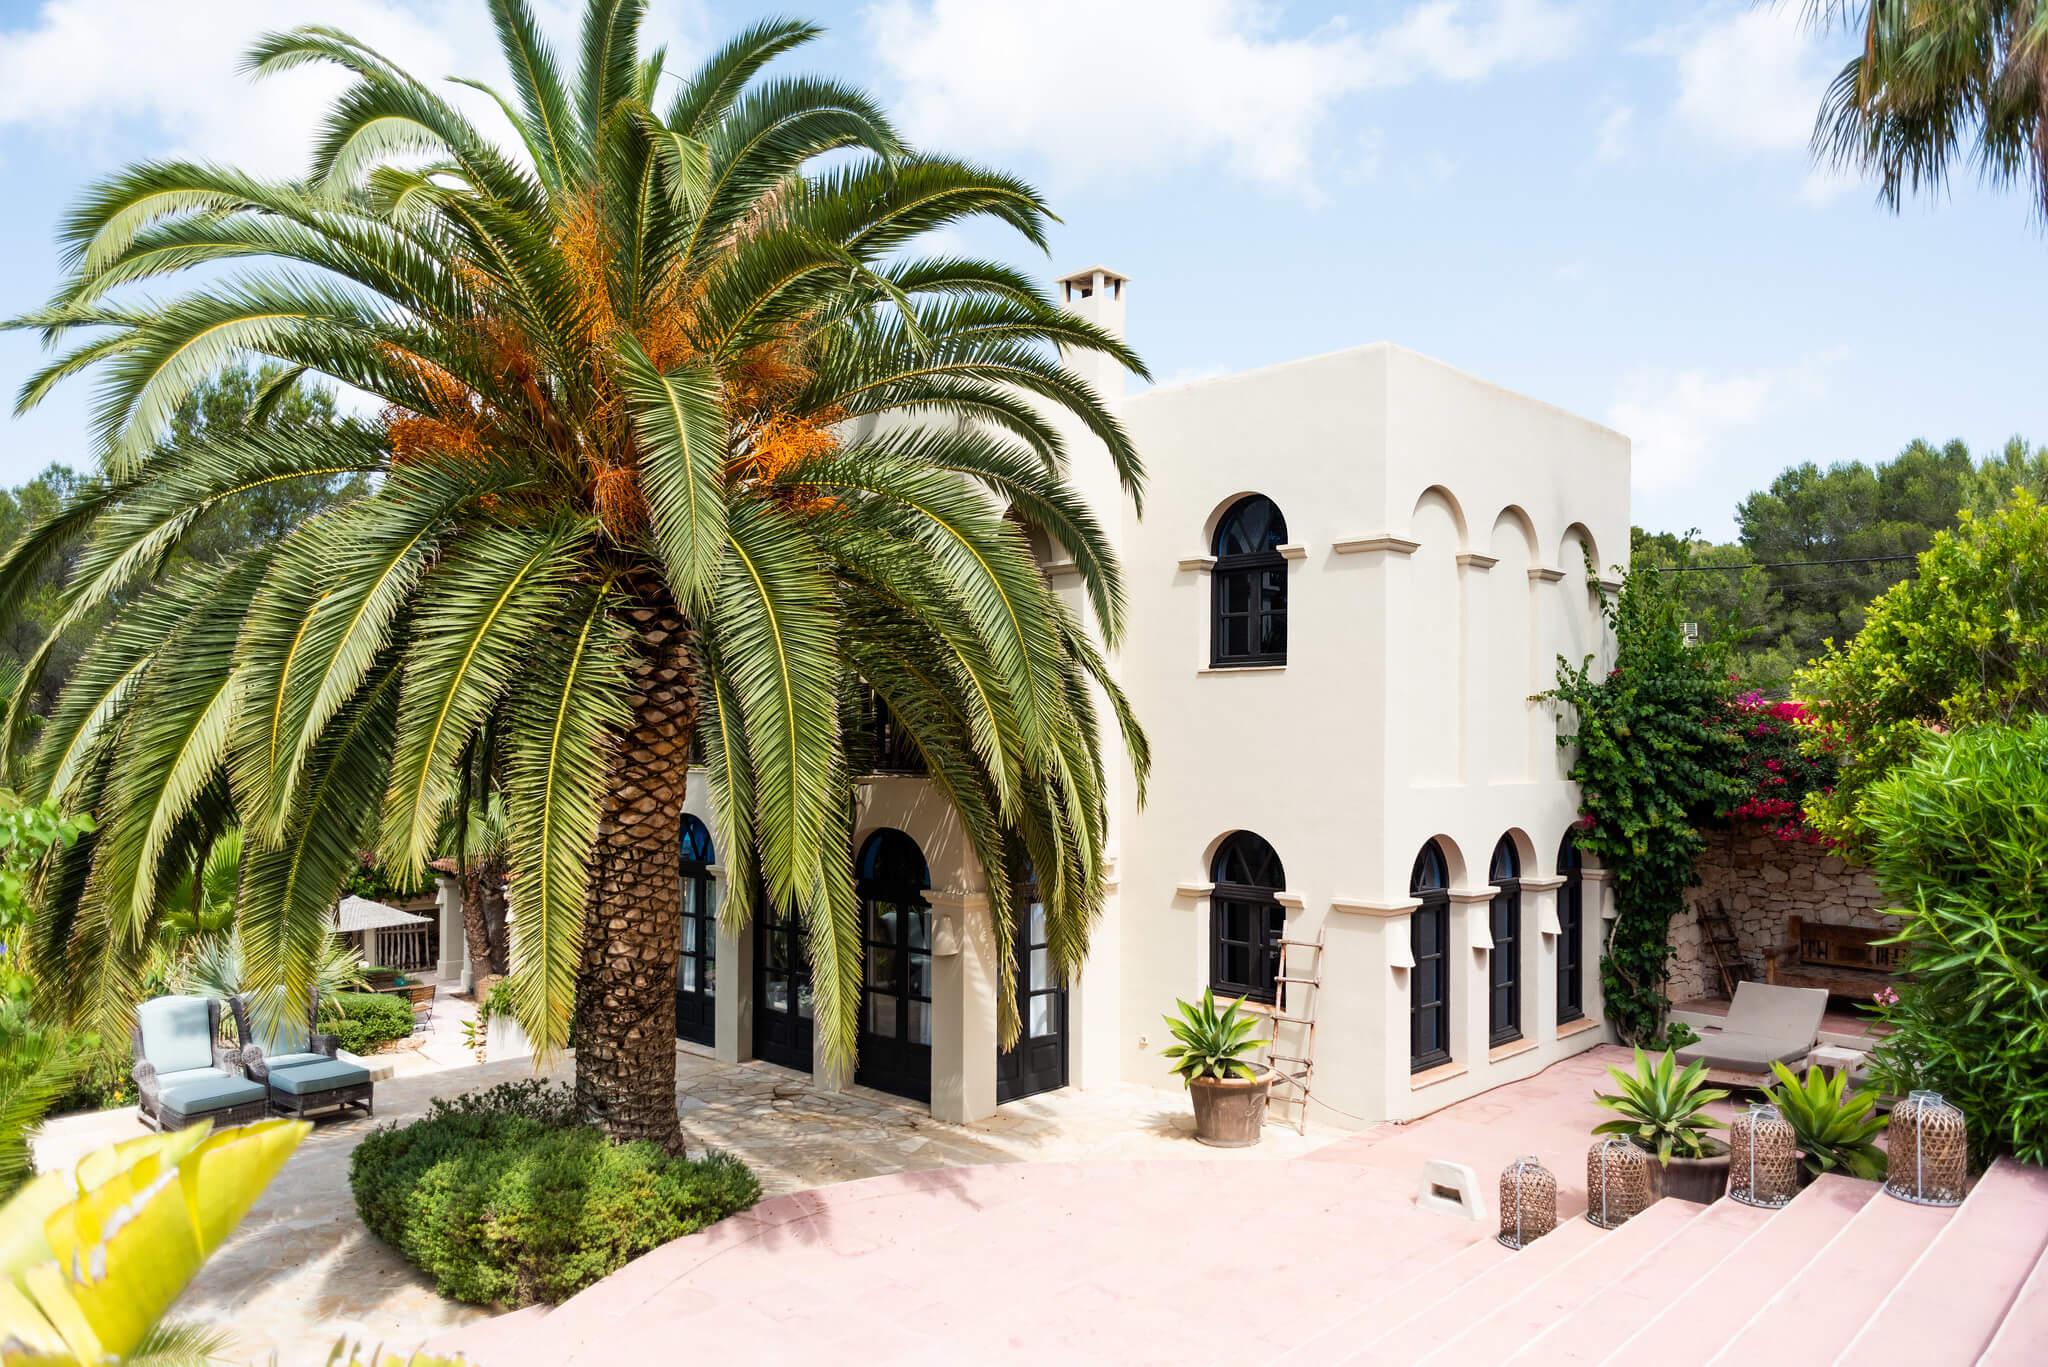 https://www.white-ibiza.com/wp-content/uploads/2020/05/white-ibiza-villas-can-riviere-exterior-facade.jpg